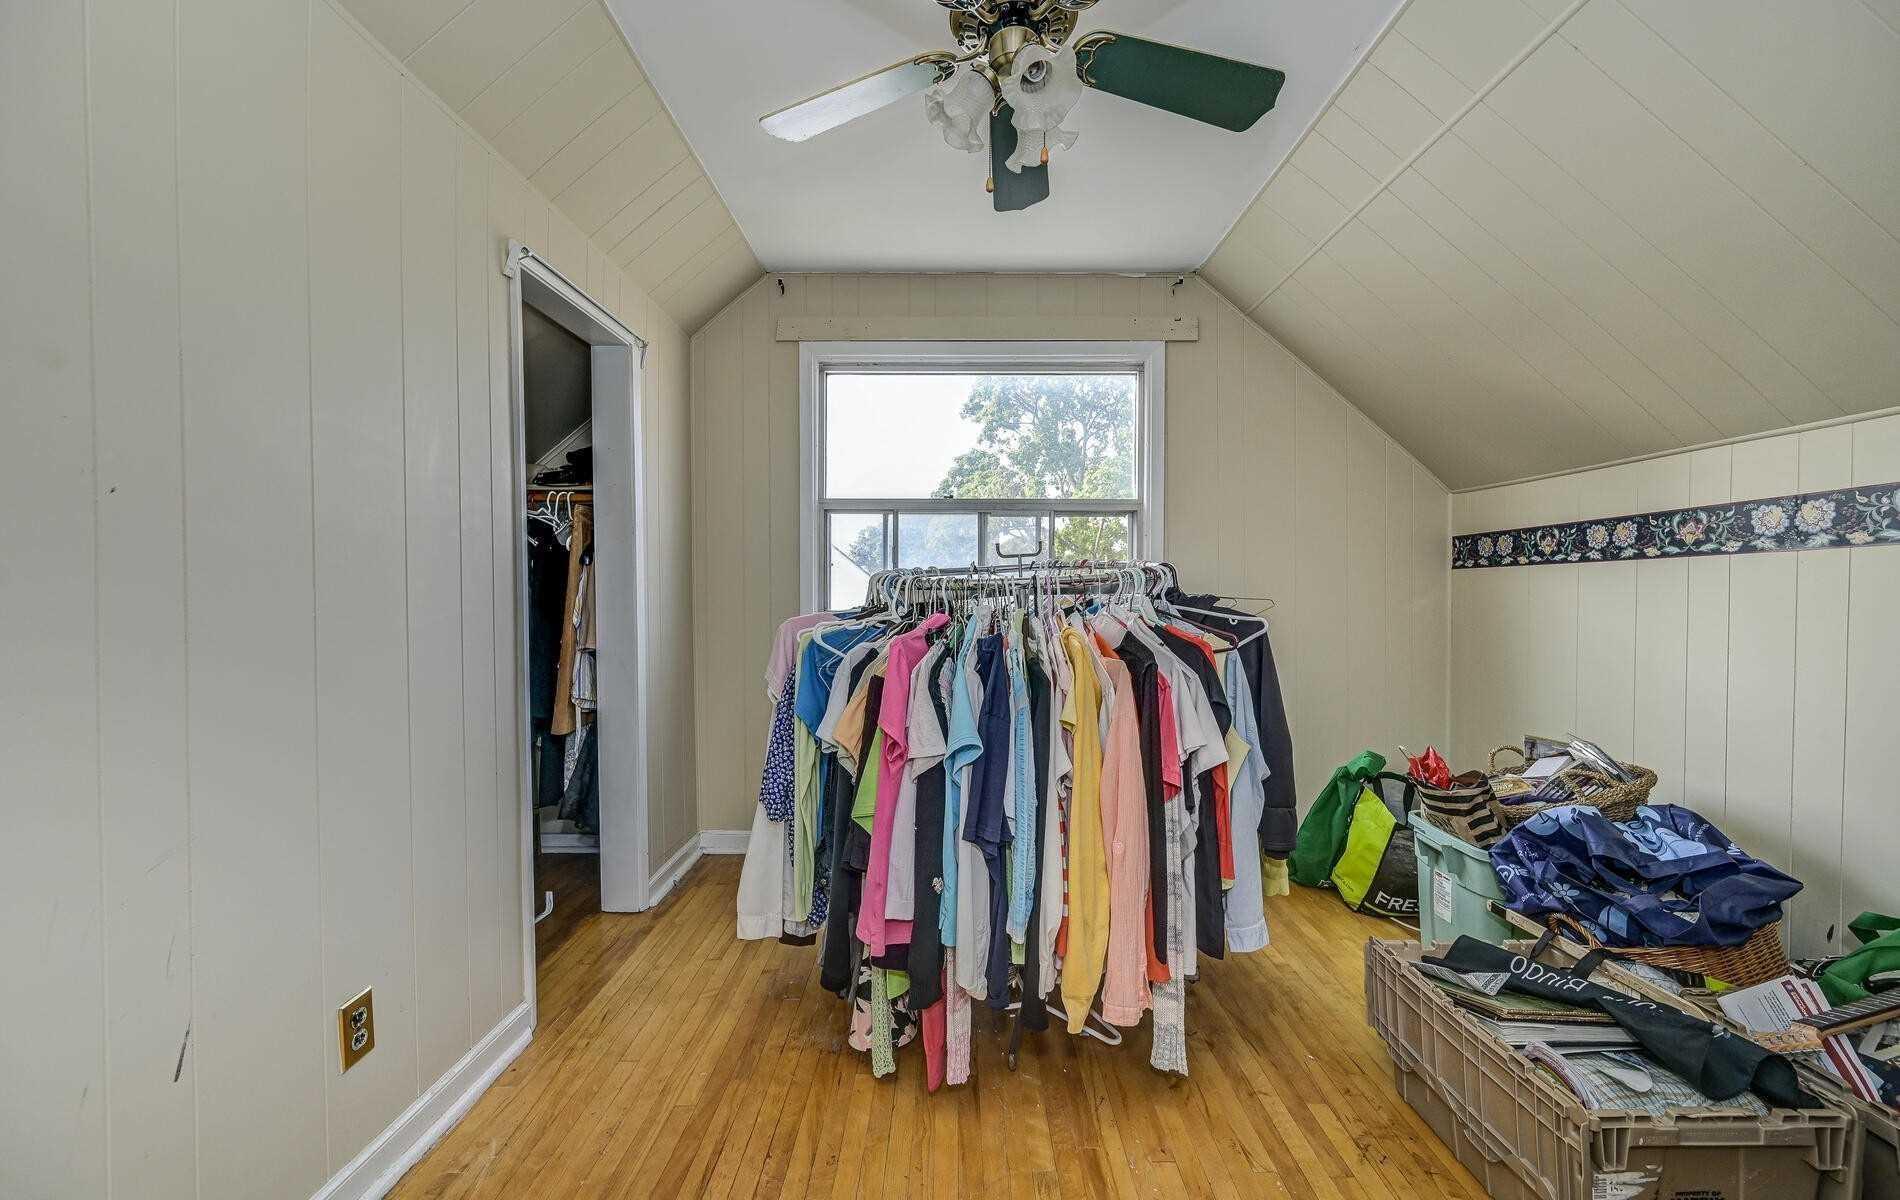 Detached house For Sale In AJAX - 76 Kings Cres, AJAX, Ontario, Canada L1S1R2 , 2 Bedrooms Bedrooms, ,1 BathroomBathrooms,Detached,For Sale,Kings